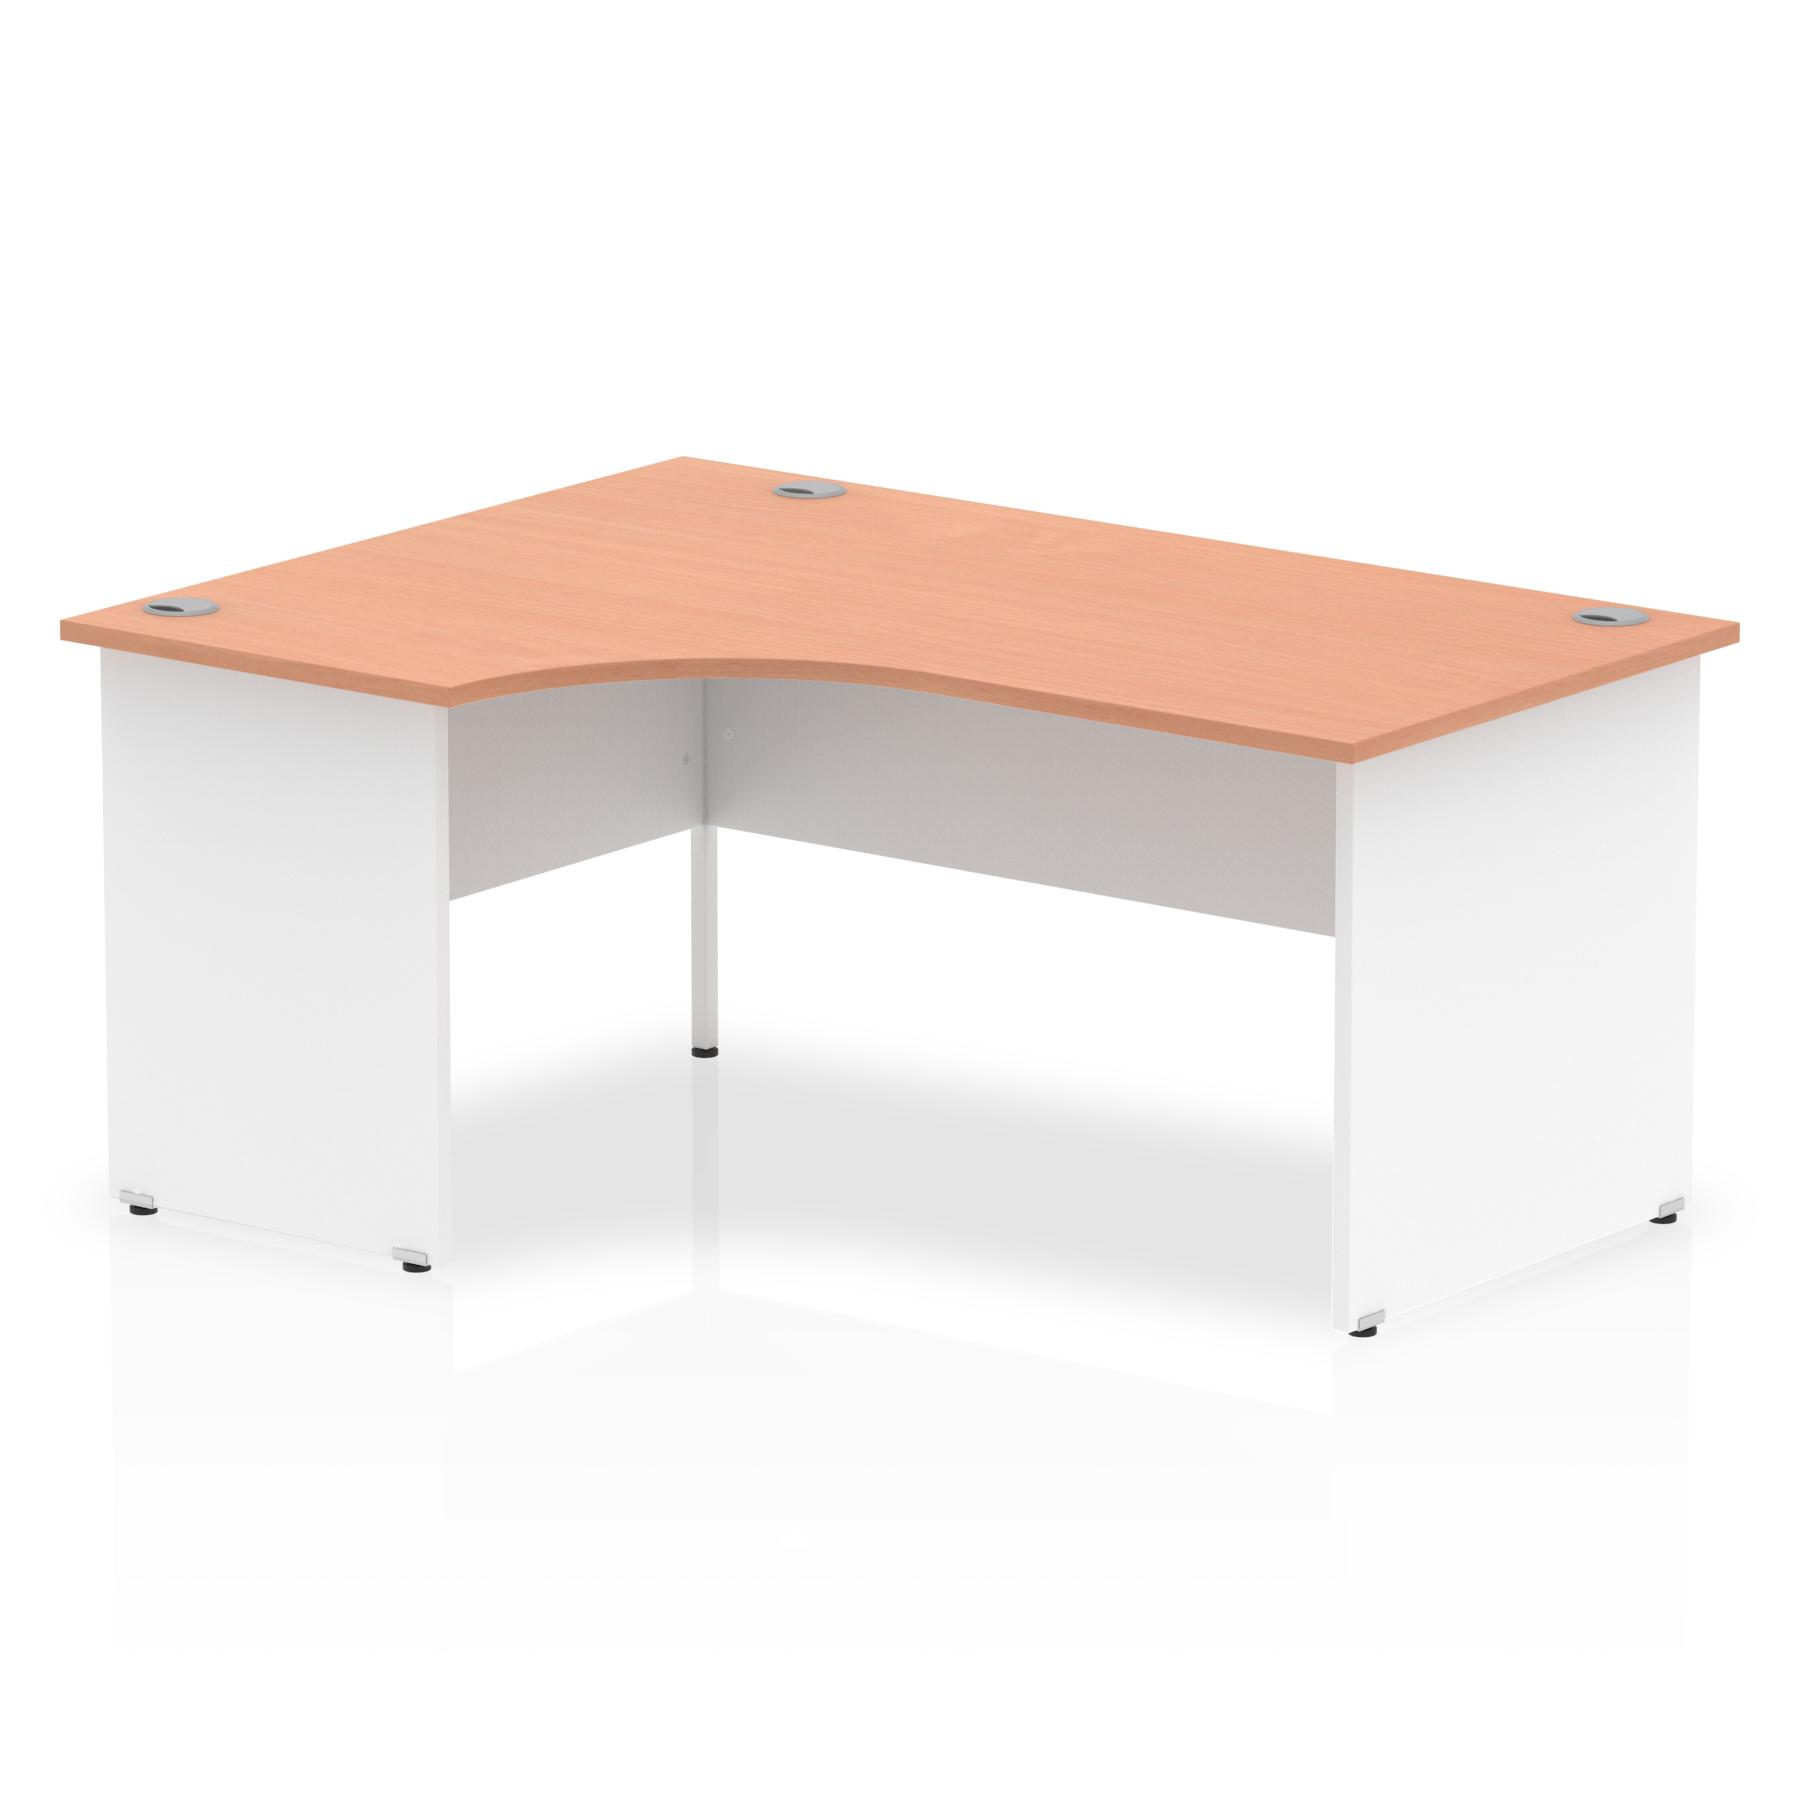 Trexus Desk Crescent Left Hand Panel End 1600x800mm Beech Top White Panels Ref TT000027